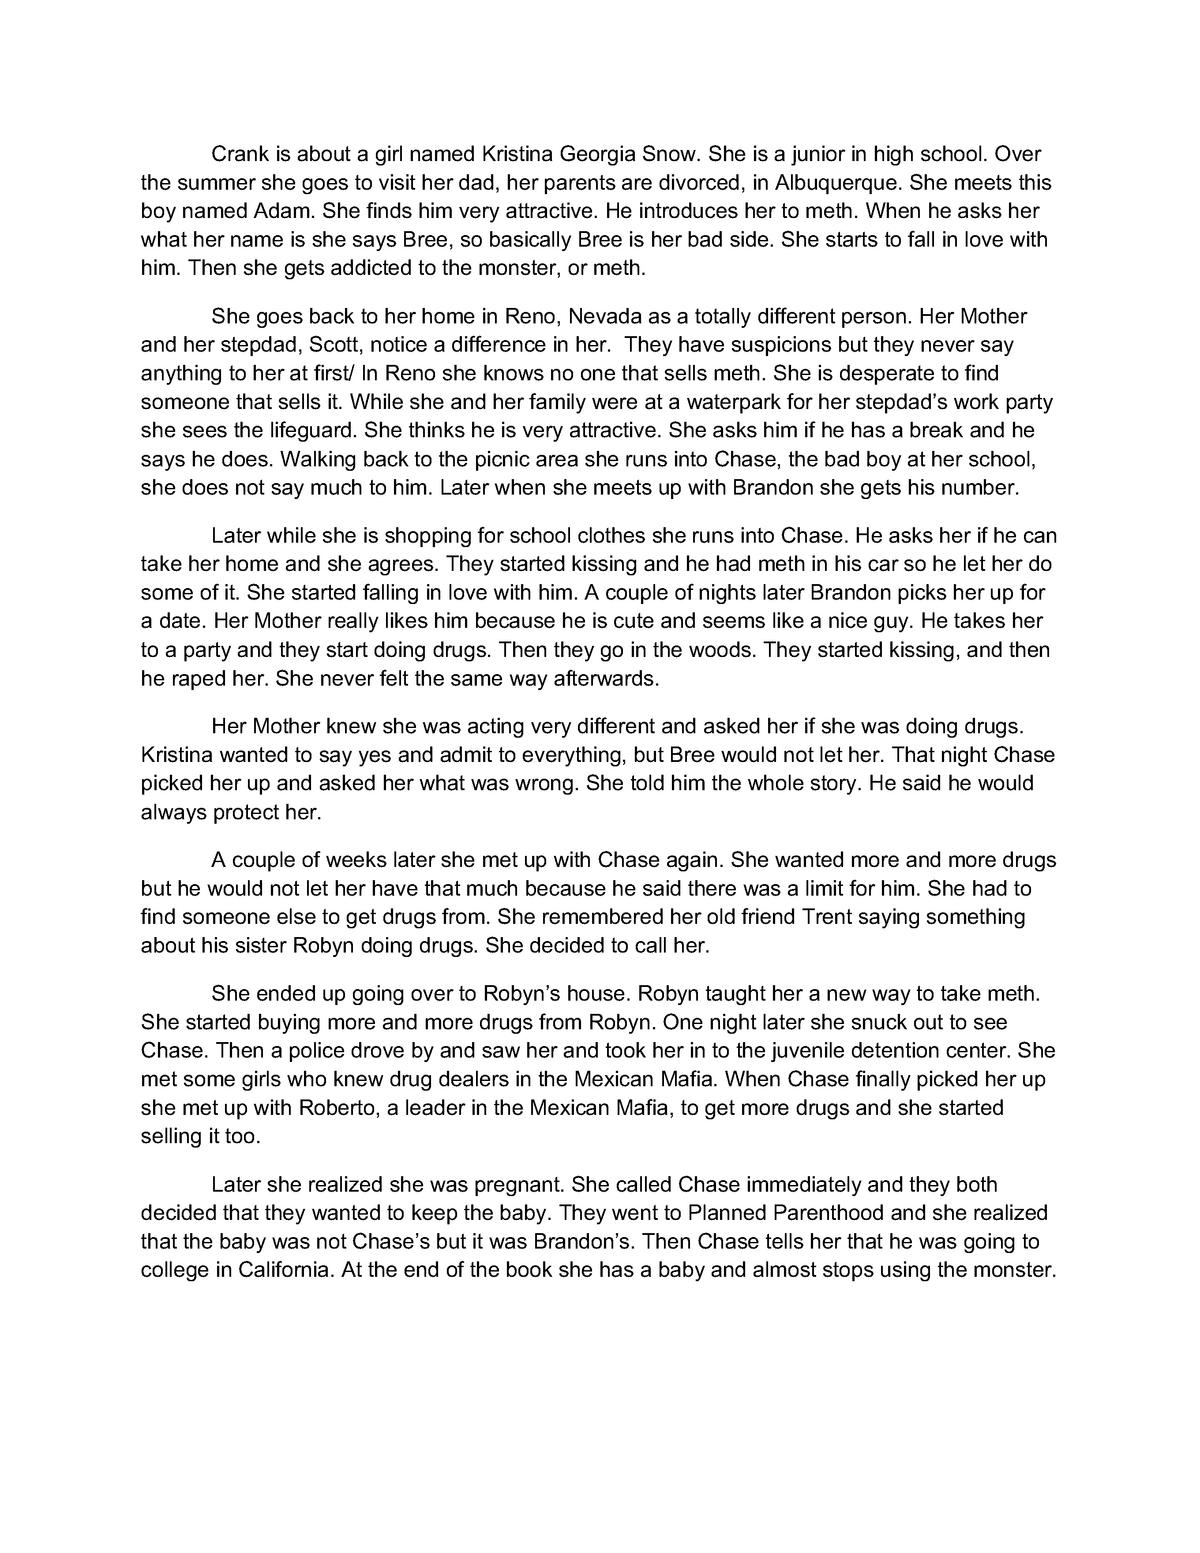 Crank Book Report - Grade: A - EH 101: English Composition I